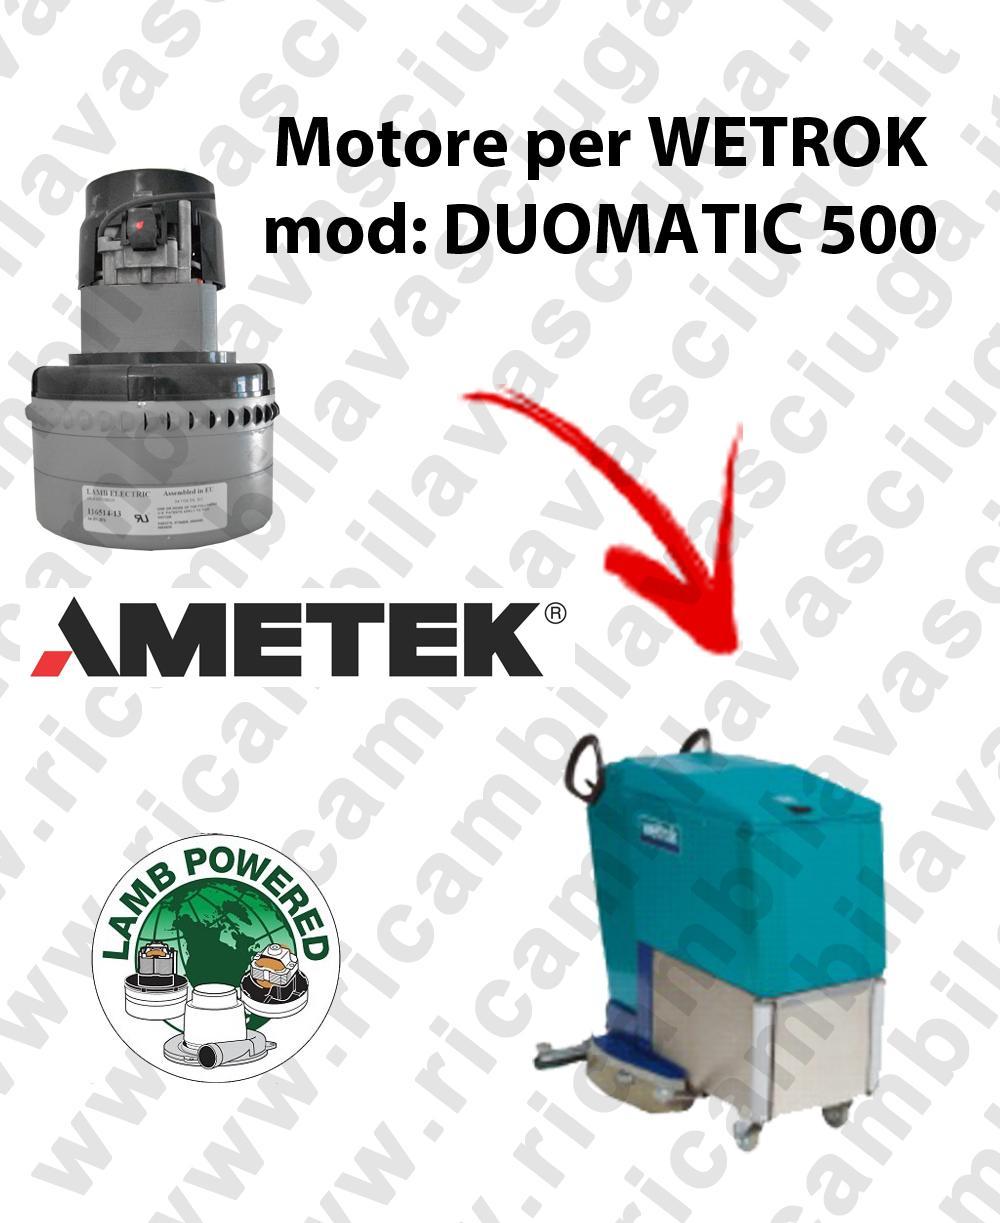 DUOMATIC 500 MOTORE LAMB AMETEK di aspirazione per lavapavimenti WETROK